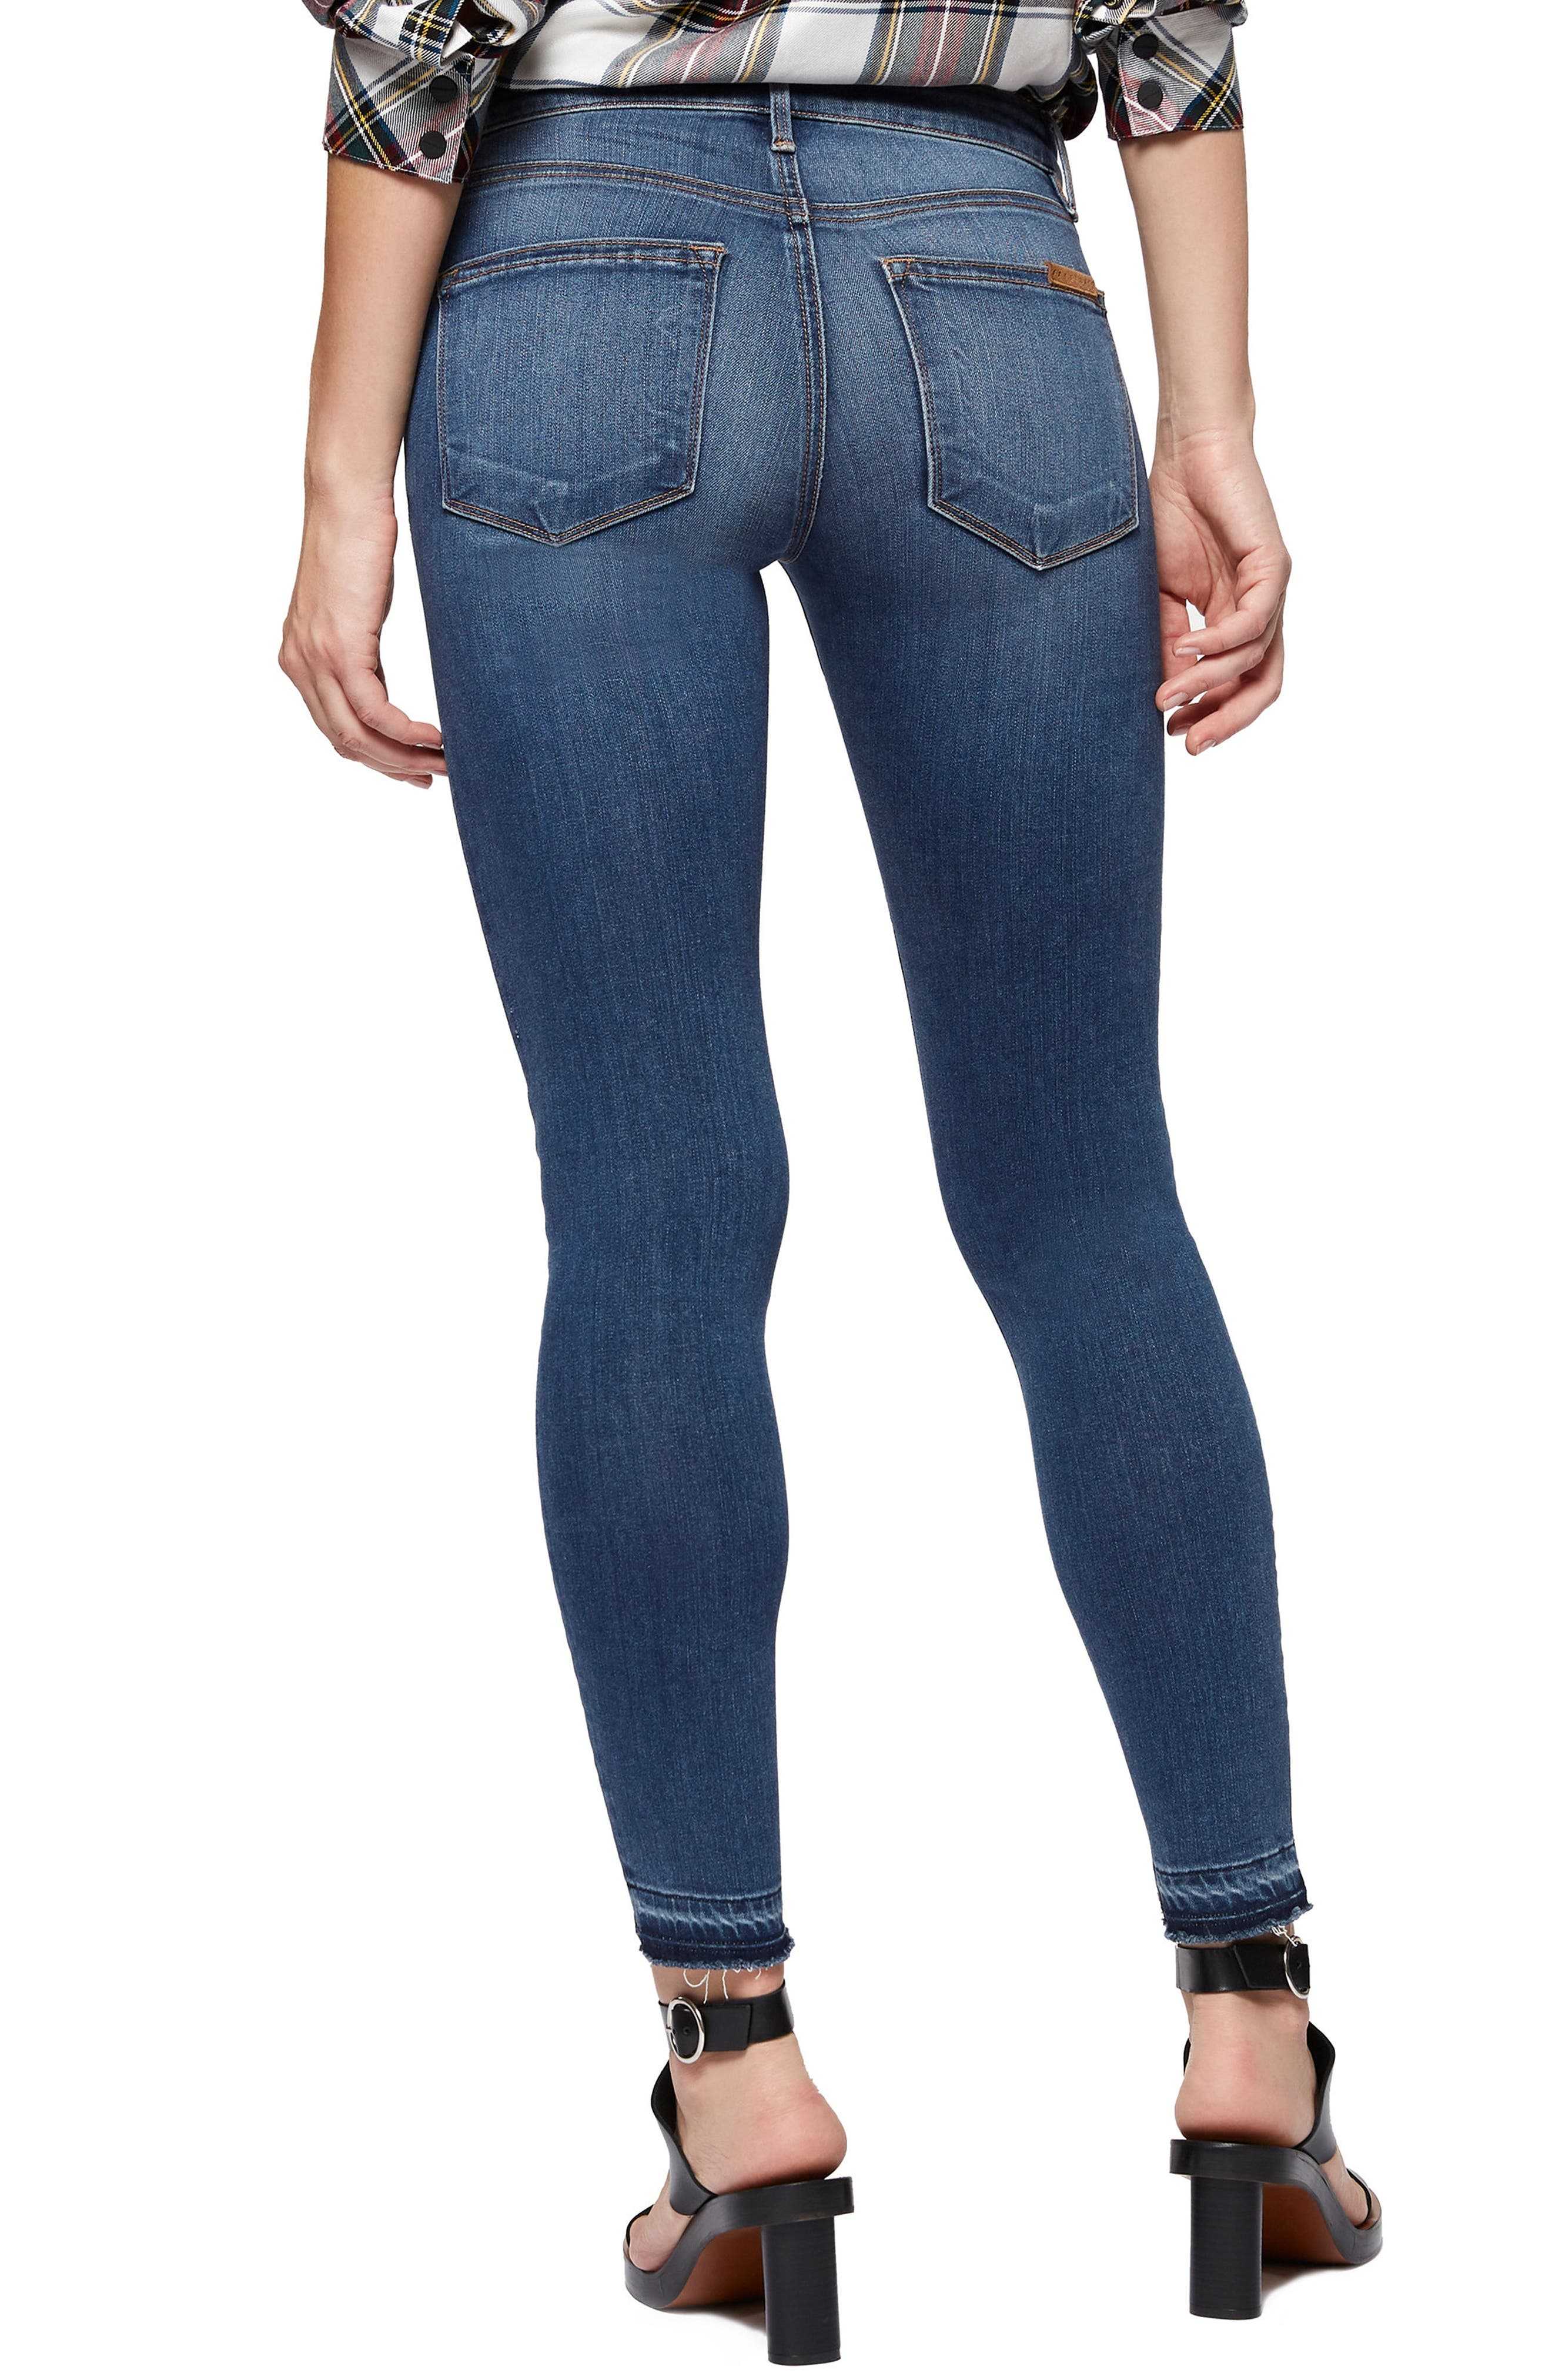 Robbie High Waist Skinny Jeans,                             Alternate thumbnail 2, color,                             421